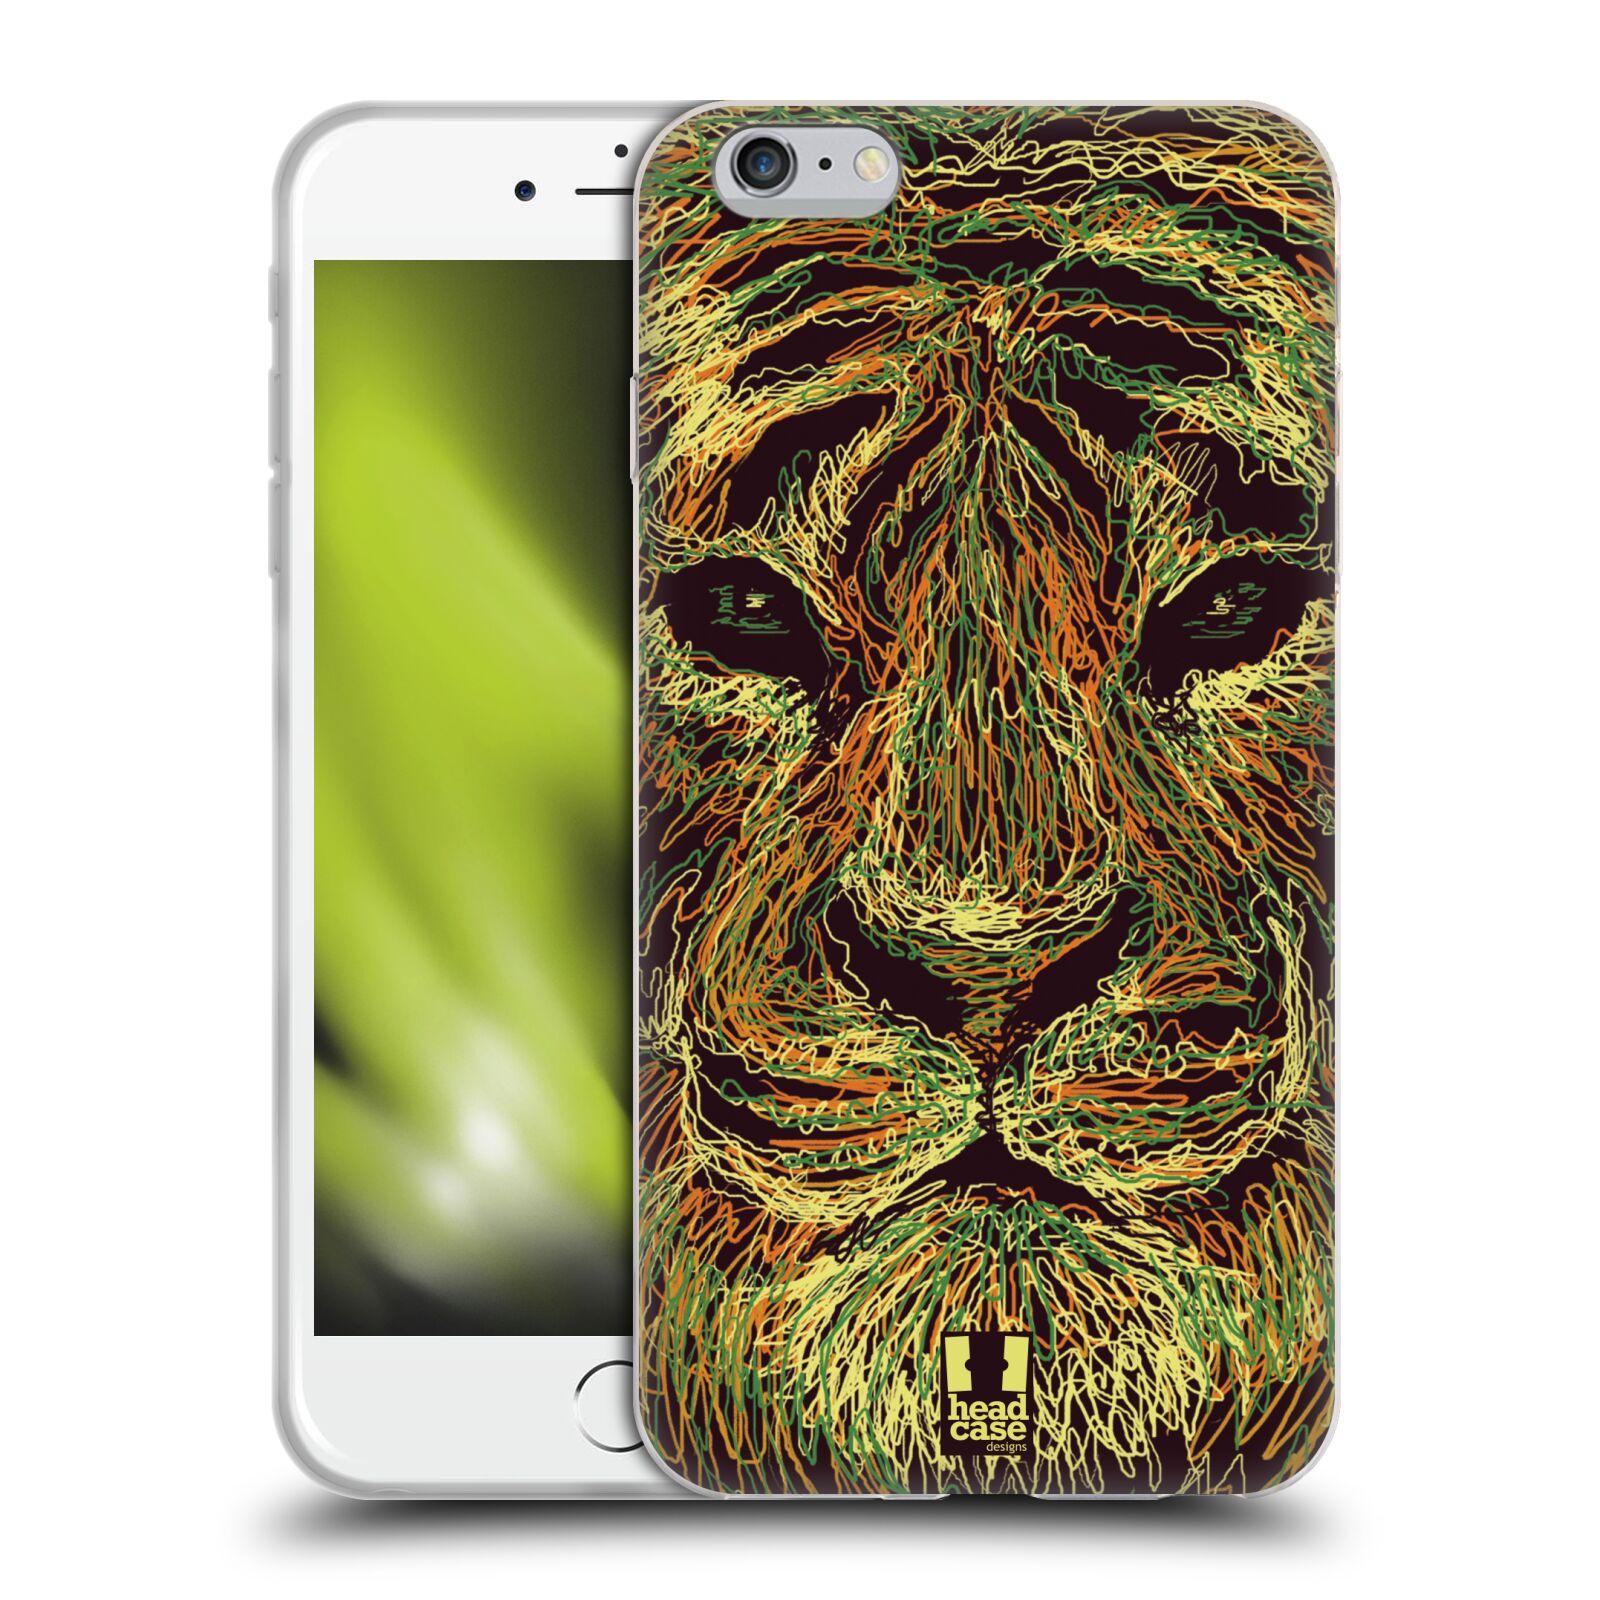 HEAD CASE silikonový obal na mobil Apple Iphone 6 PLUS/ 6S PLUS vzor zvíře čmáranice tygr